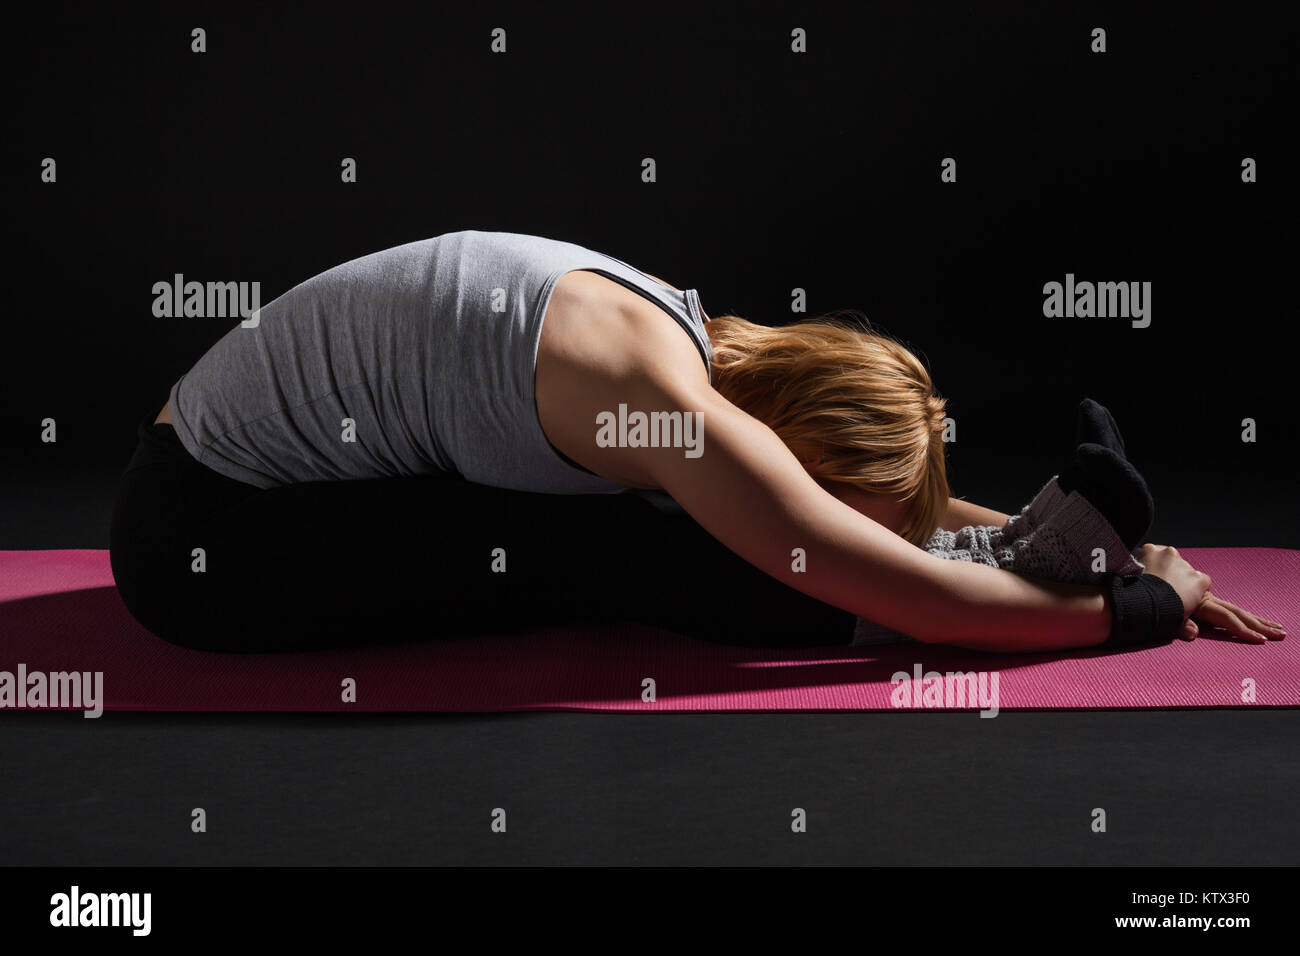 Young woman practicing yoga, Paschimottanasana / variation of Seated Forward Bend pose - Stock Image